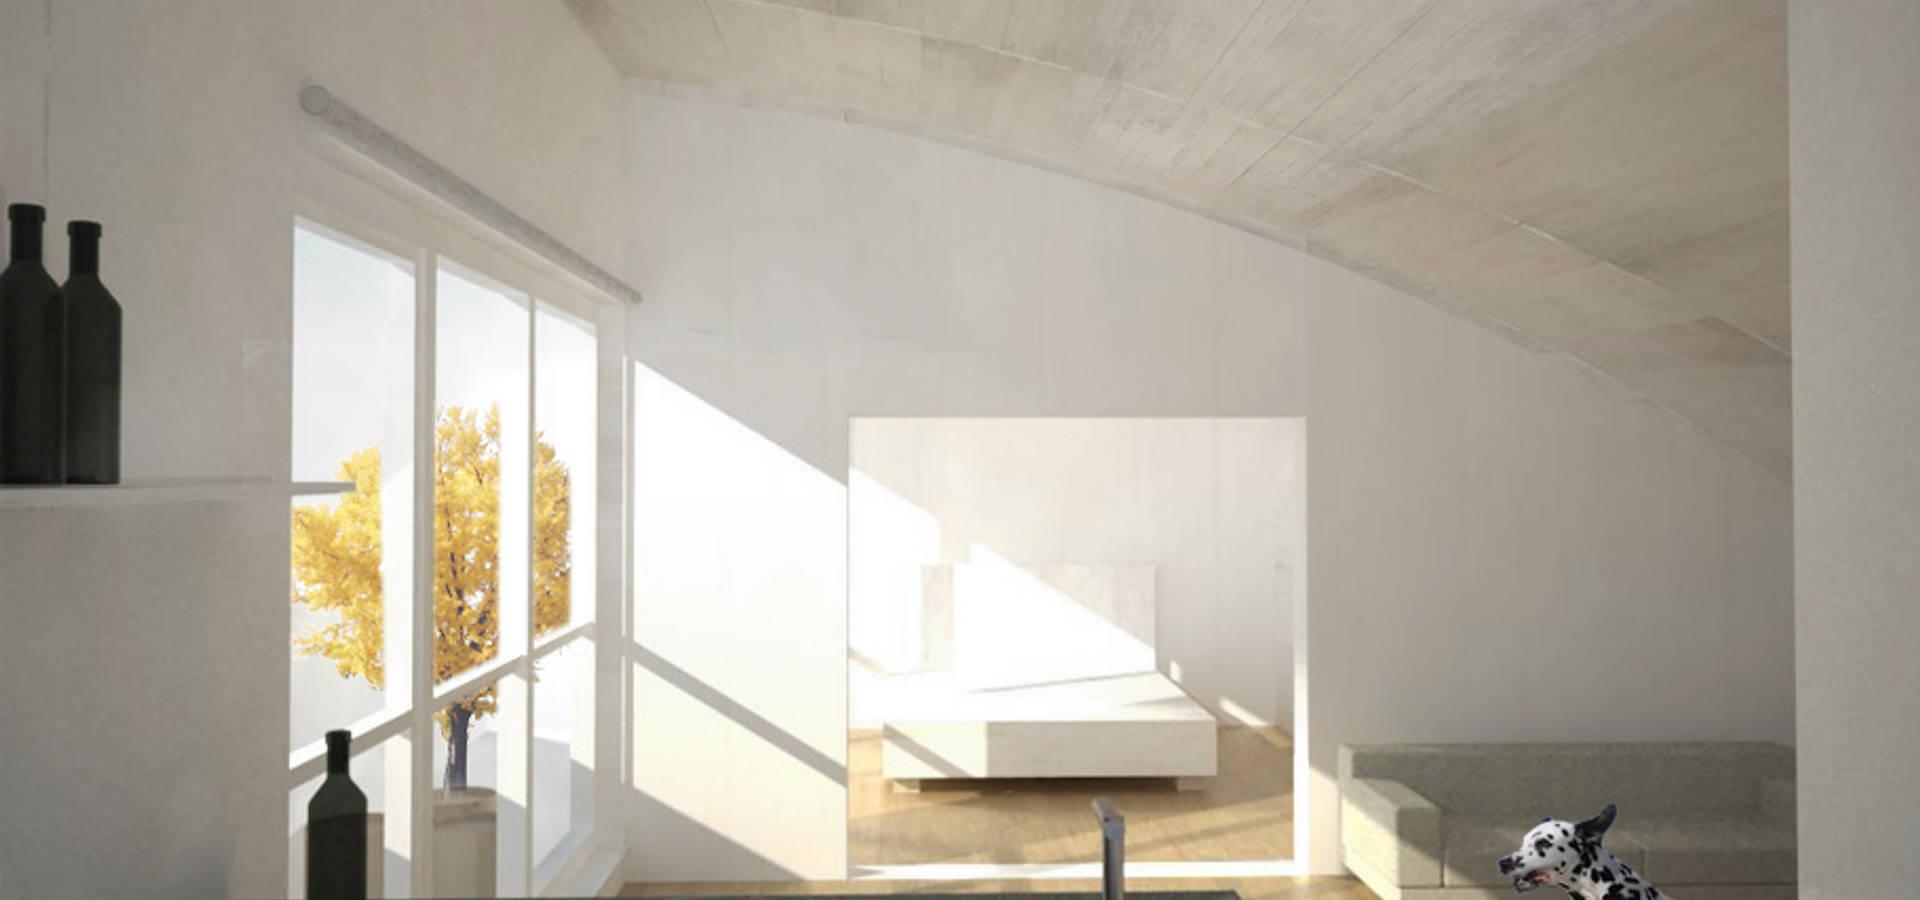 Brut Deluxe Architektur + Design